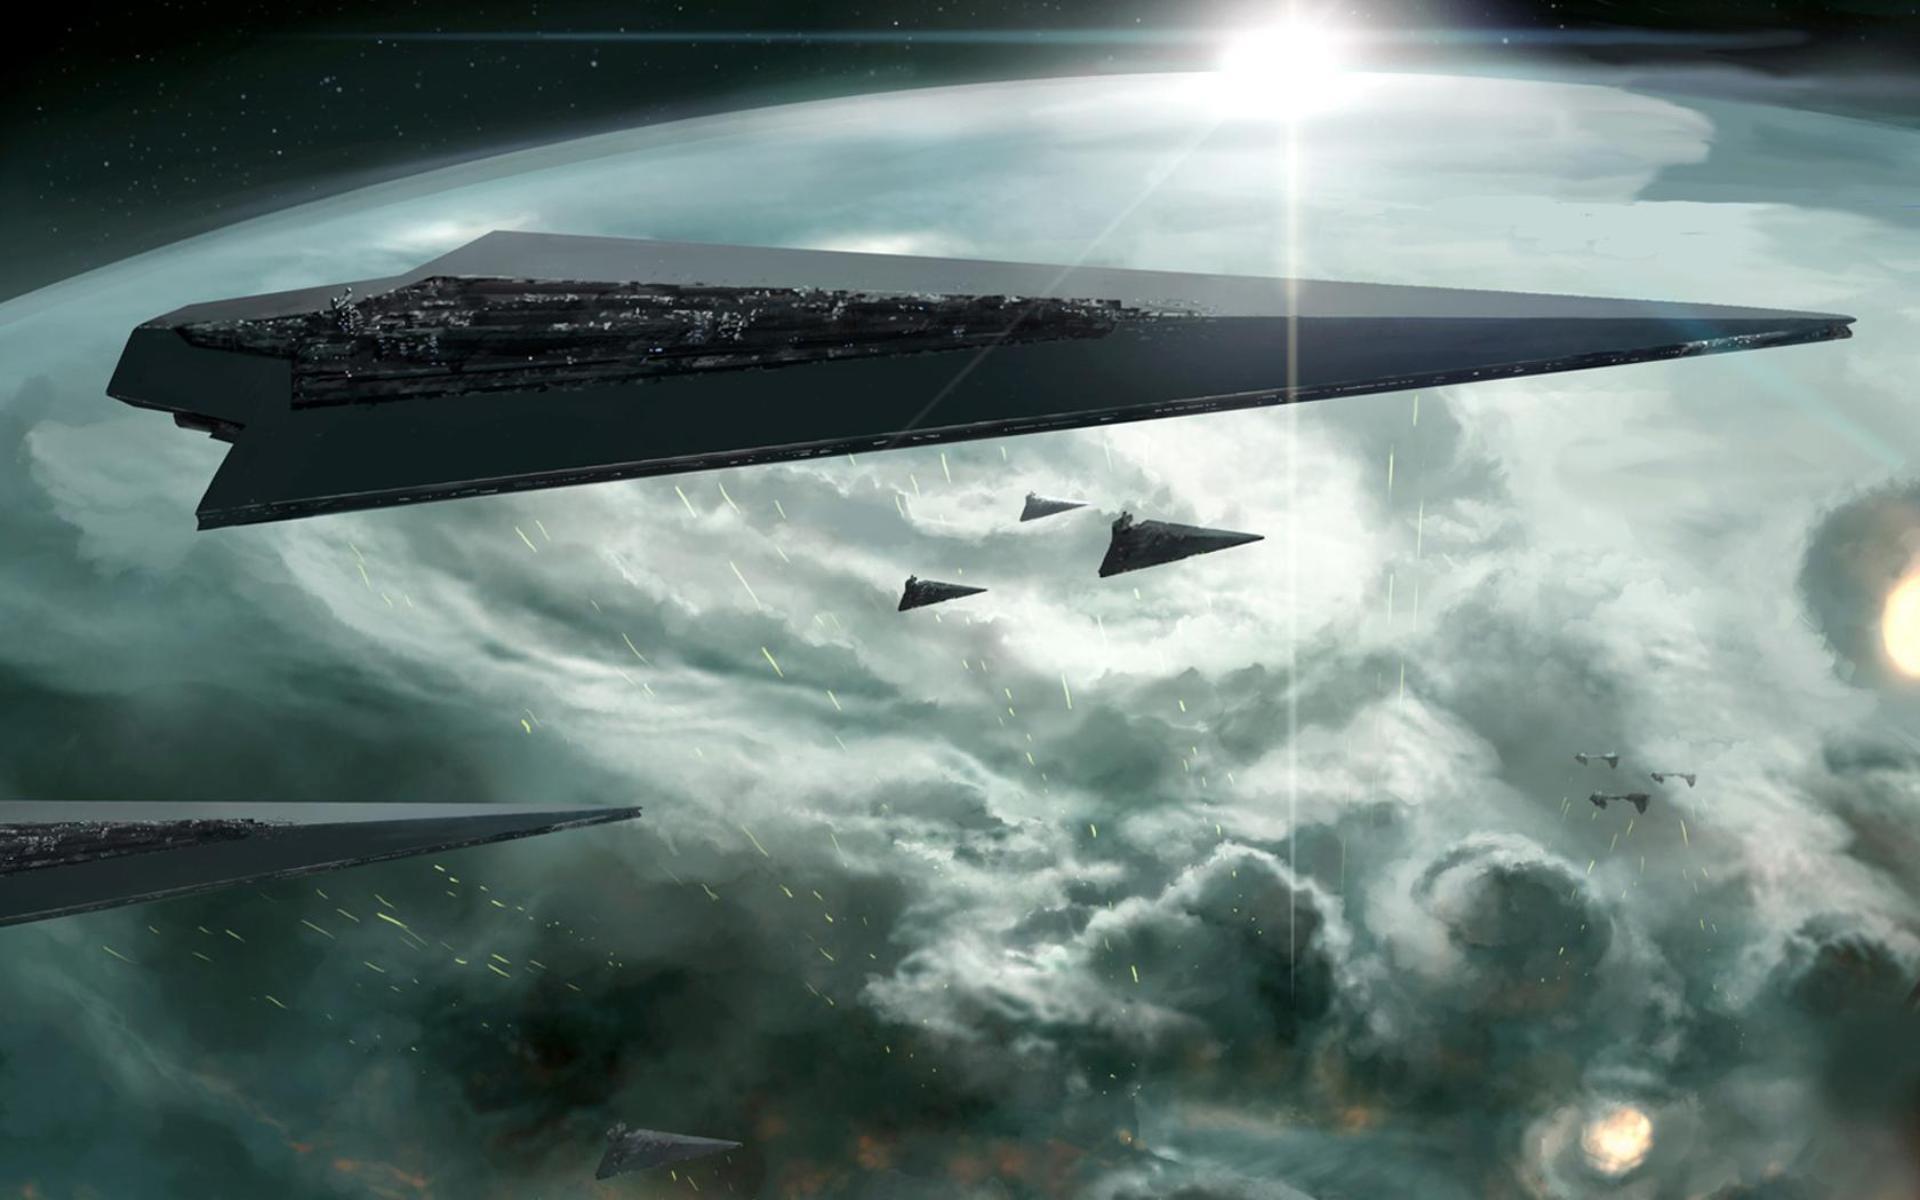 Star Wars Outer Space Artwork Star Destroyer Wallpaper 1920x1200 10227 Wallpaperup